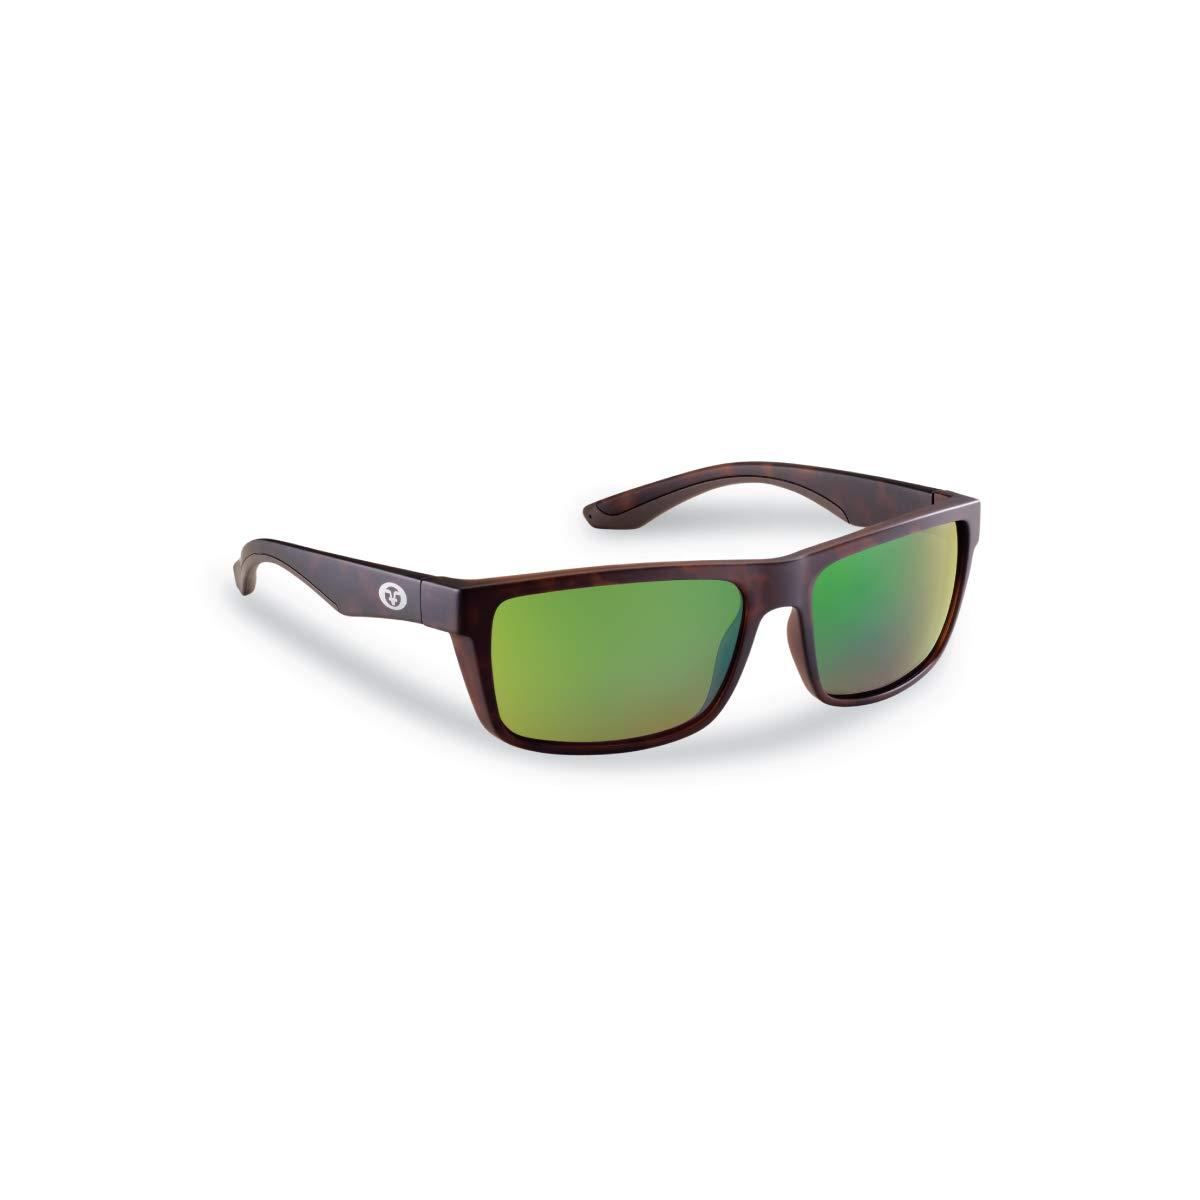 Flying Fisherman Polarized Sunglasses Amber Green